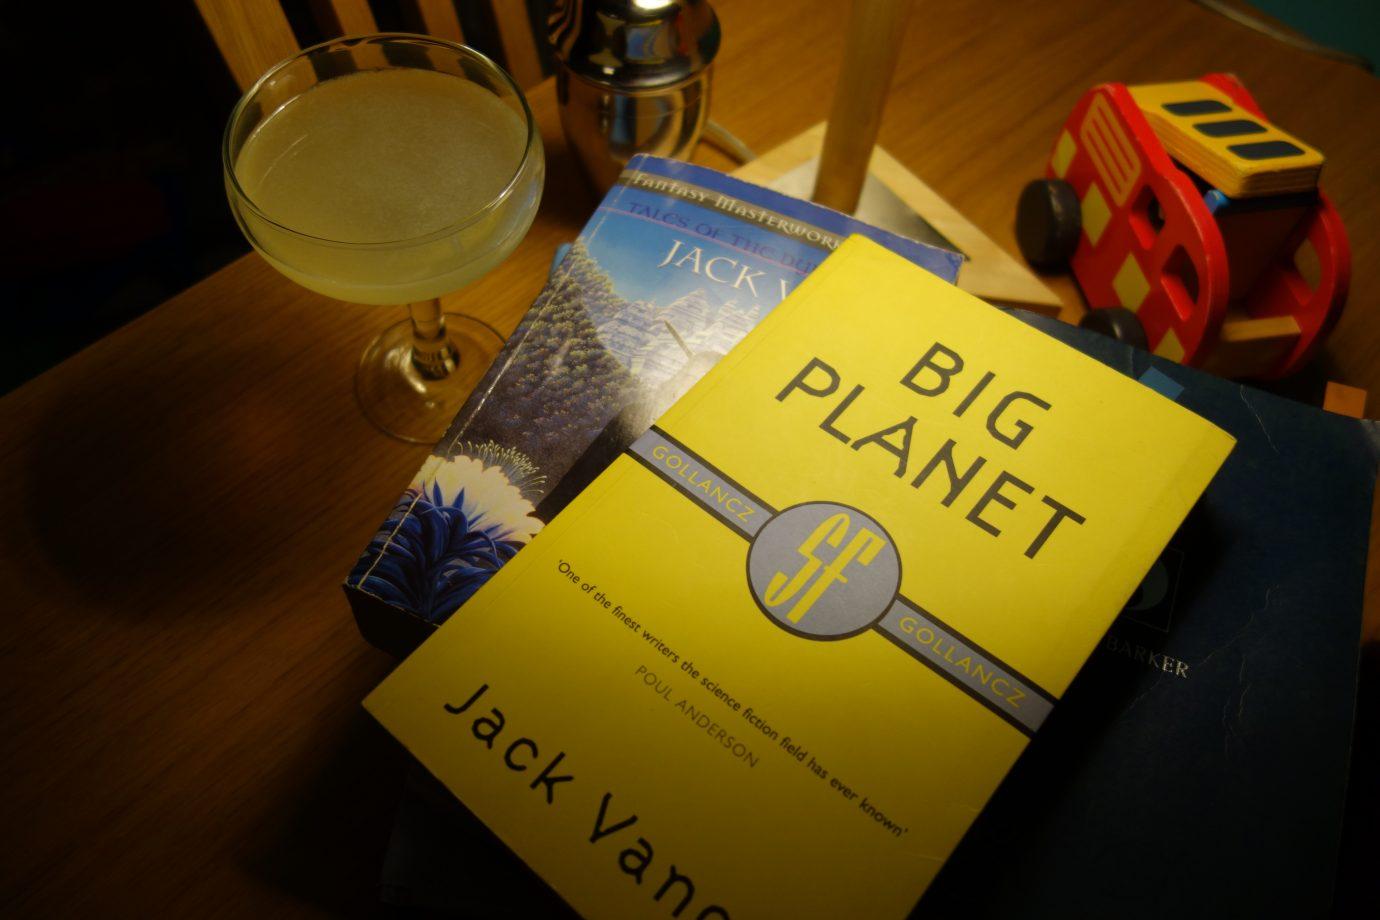 Episode 53: Big Planet by Jack Vance